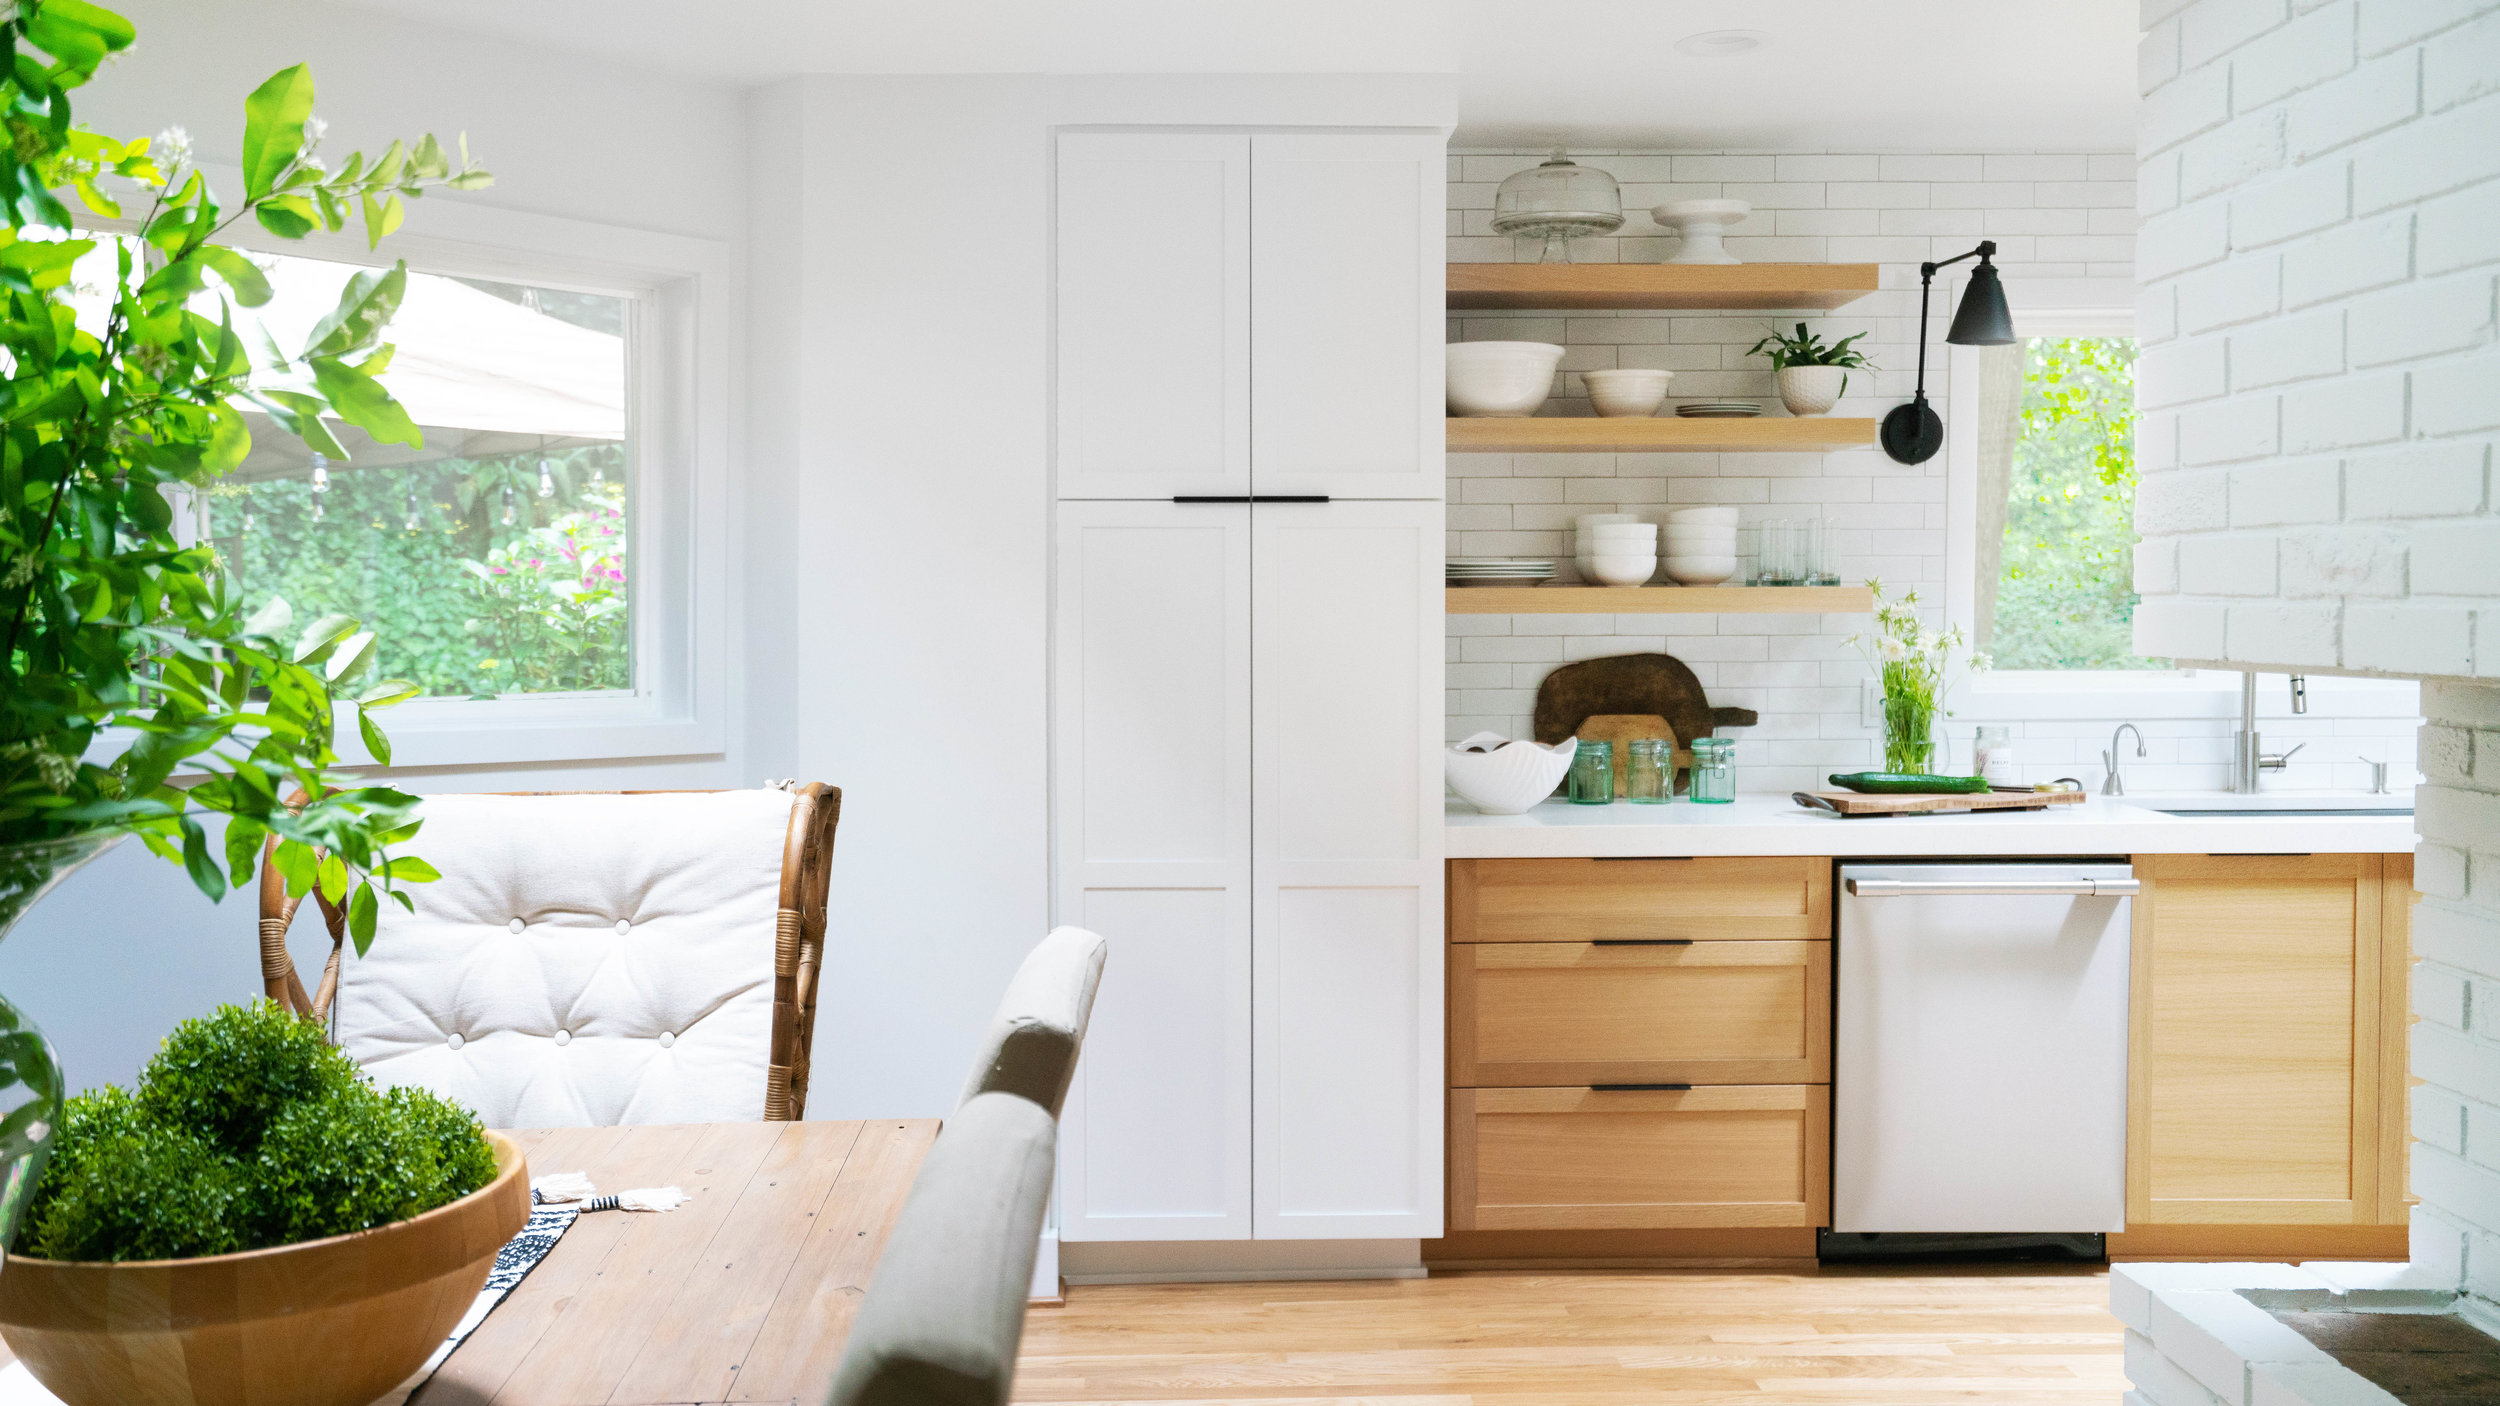 LO Midcentury Kitchen remodel.jpg